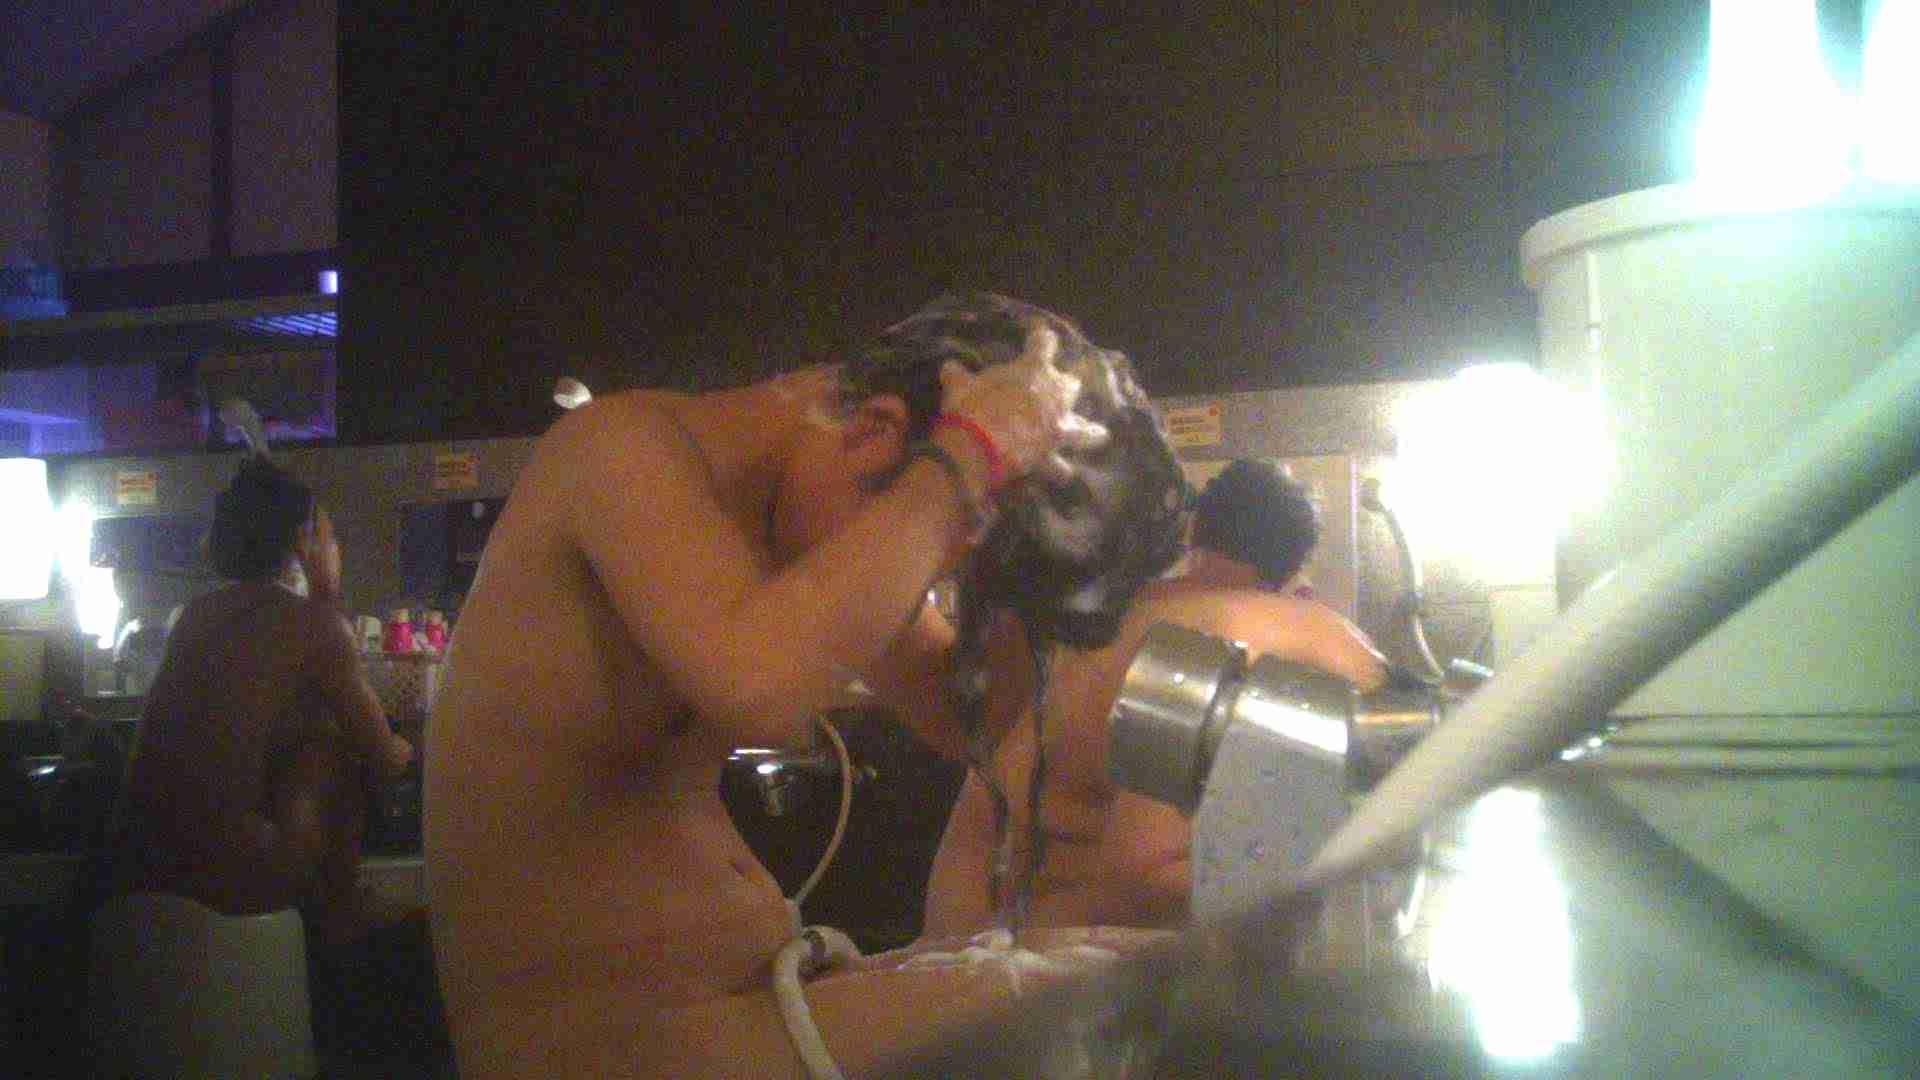 TG.01 【上等兵】お上品な女子大生の少し小さな胸をどうぞ 貧乳 性交動画流出 66画像 19